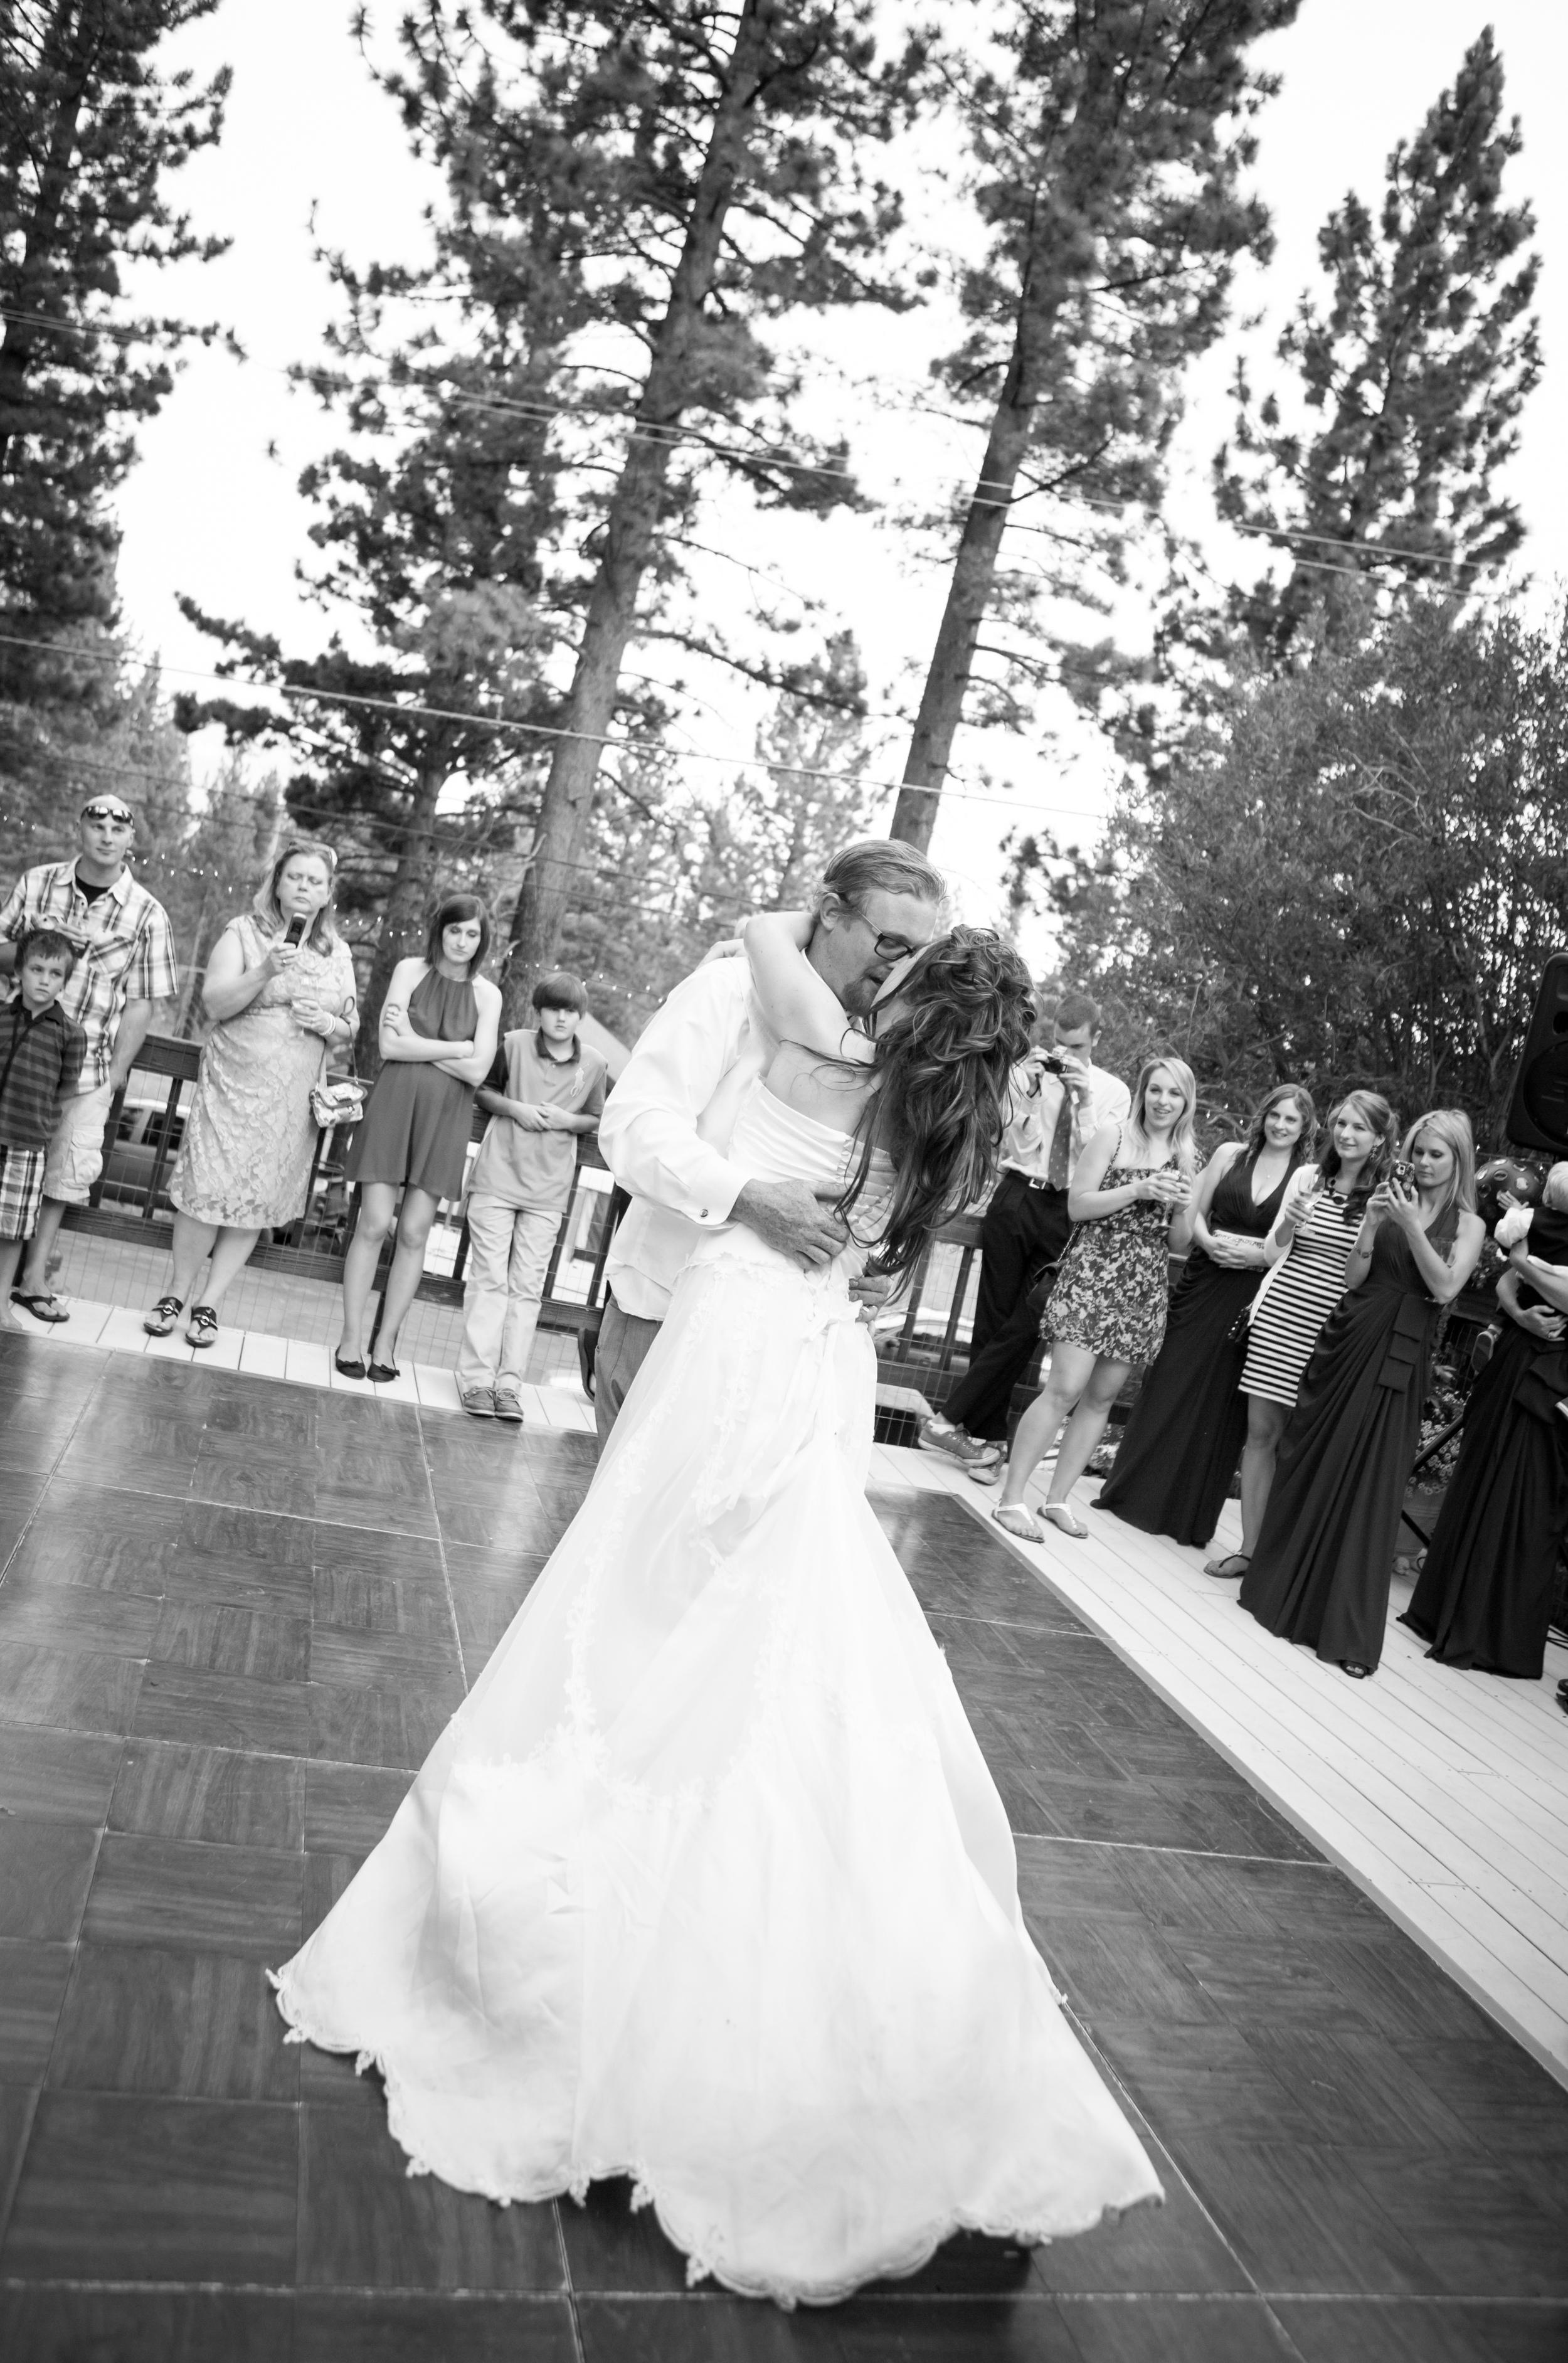 Merhaut_Wedding_2014_560-2.jpg